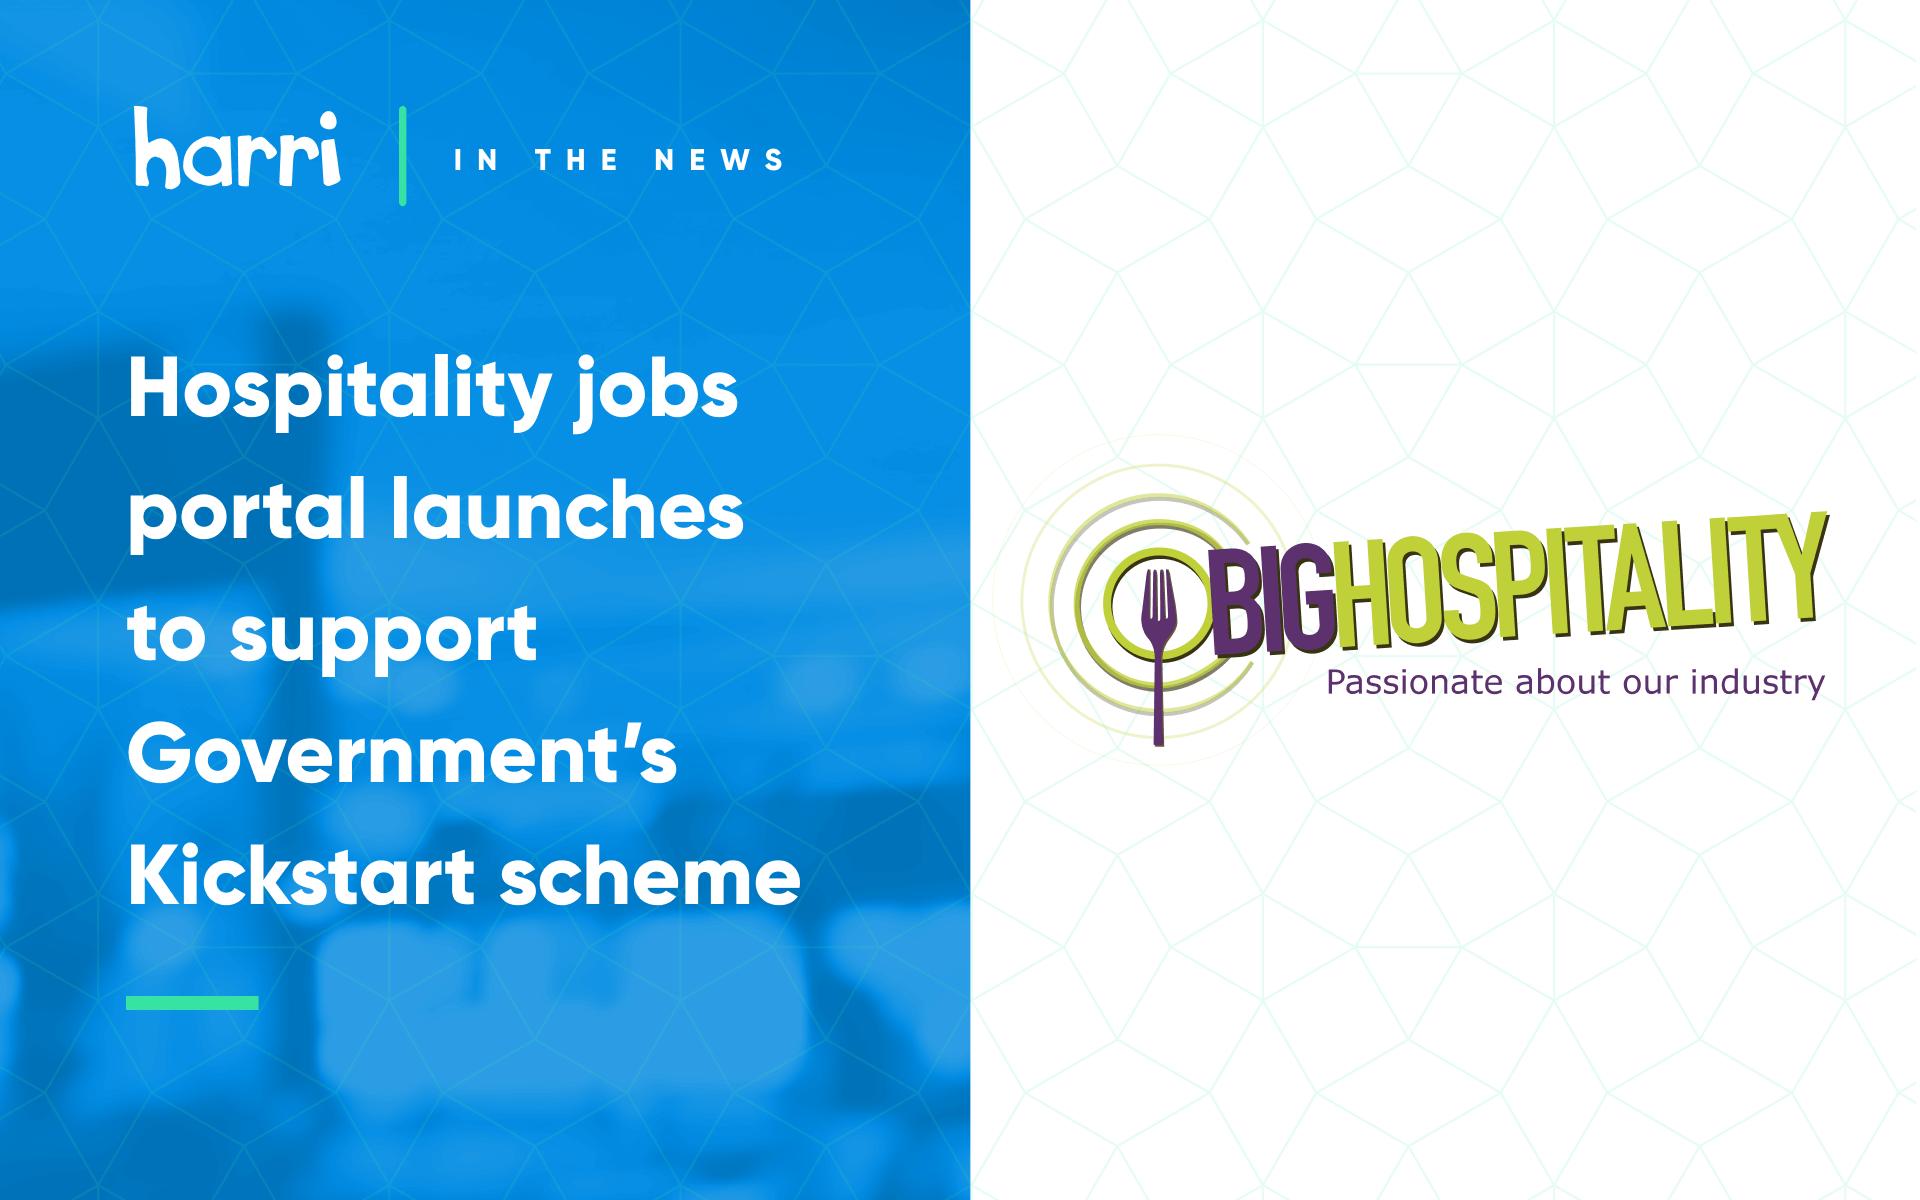 Kickstart Scheme from Big Hospitality